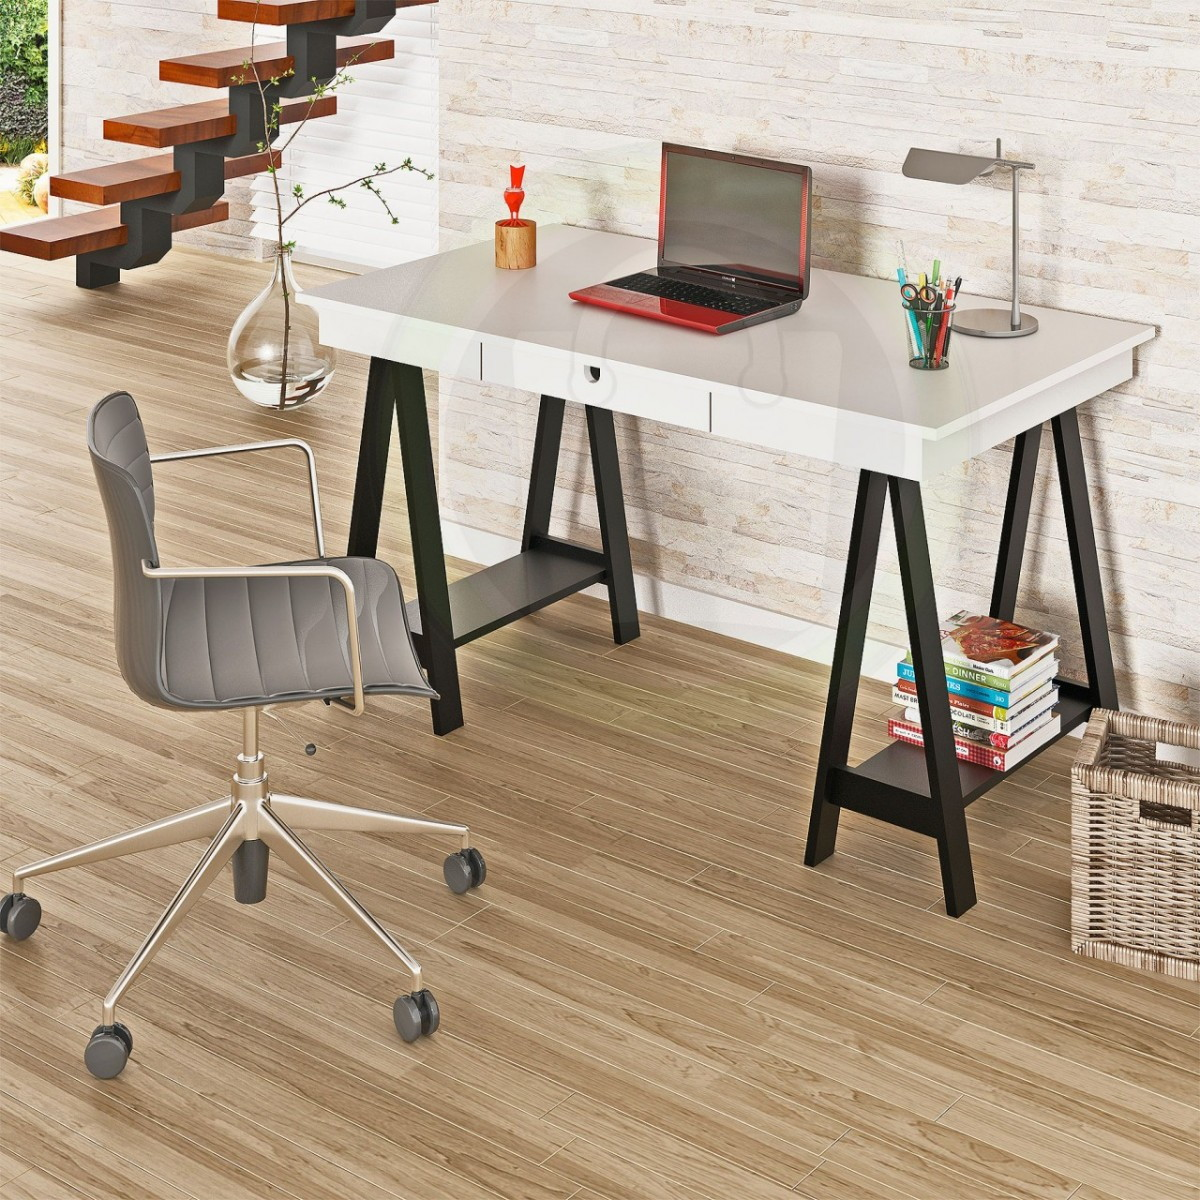 Mesa Cavalete Escrivaninha Moderna Lac Jeferson Elo7 #AA3721 1200x1200